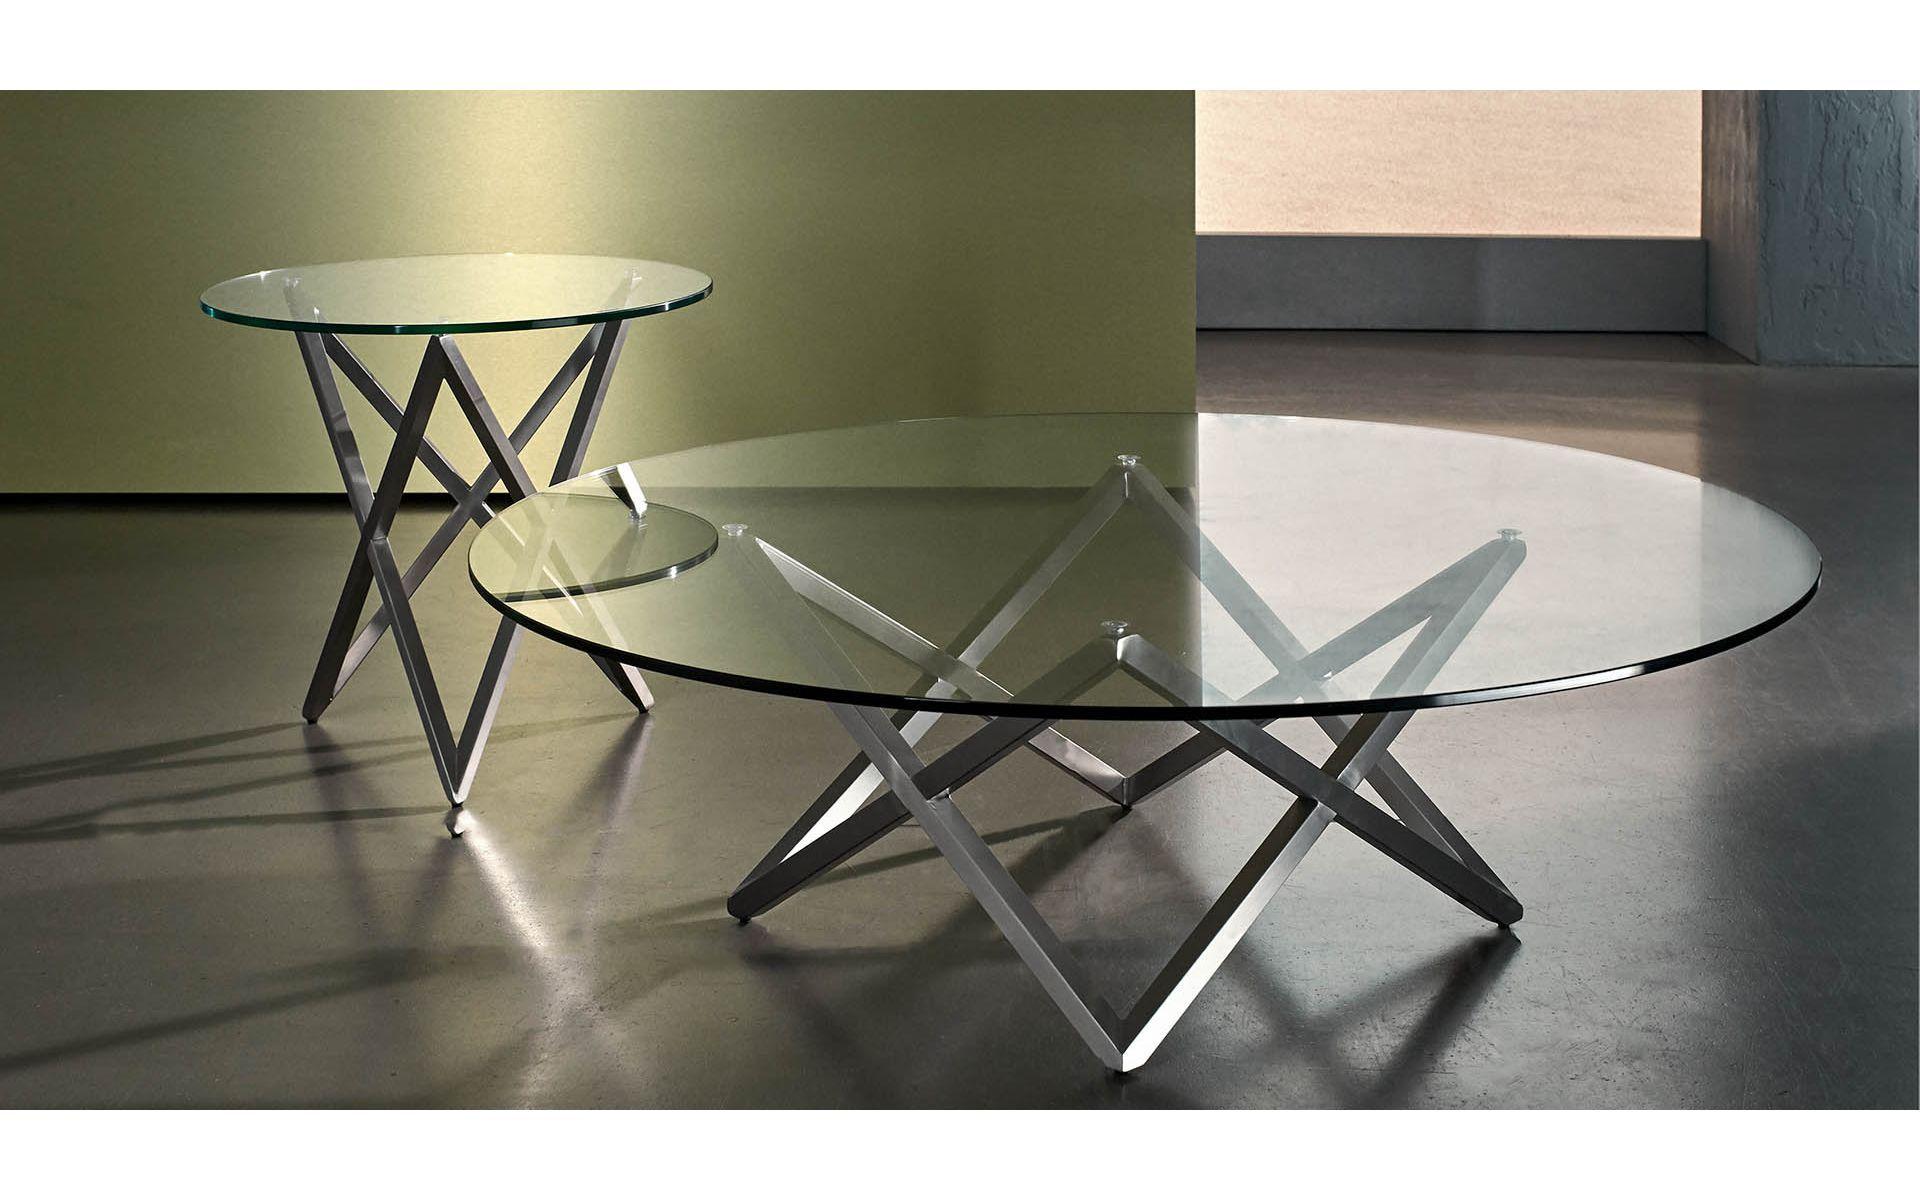 Star Nick Scali Furniture Nz Coffee Table Coffee Table Legs Table [ 1200 x 1920 Pixel ]